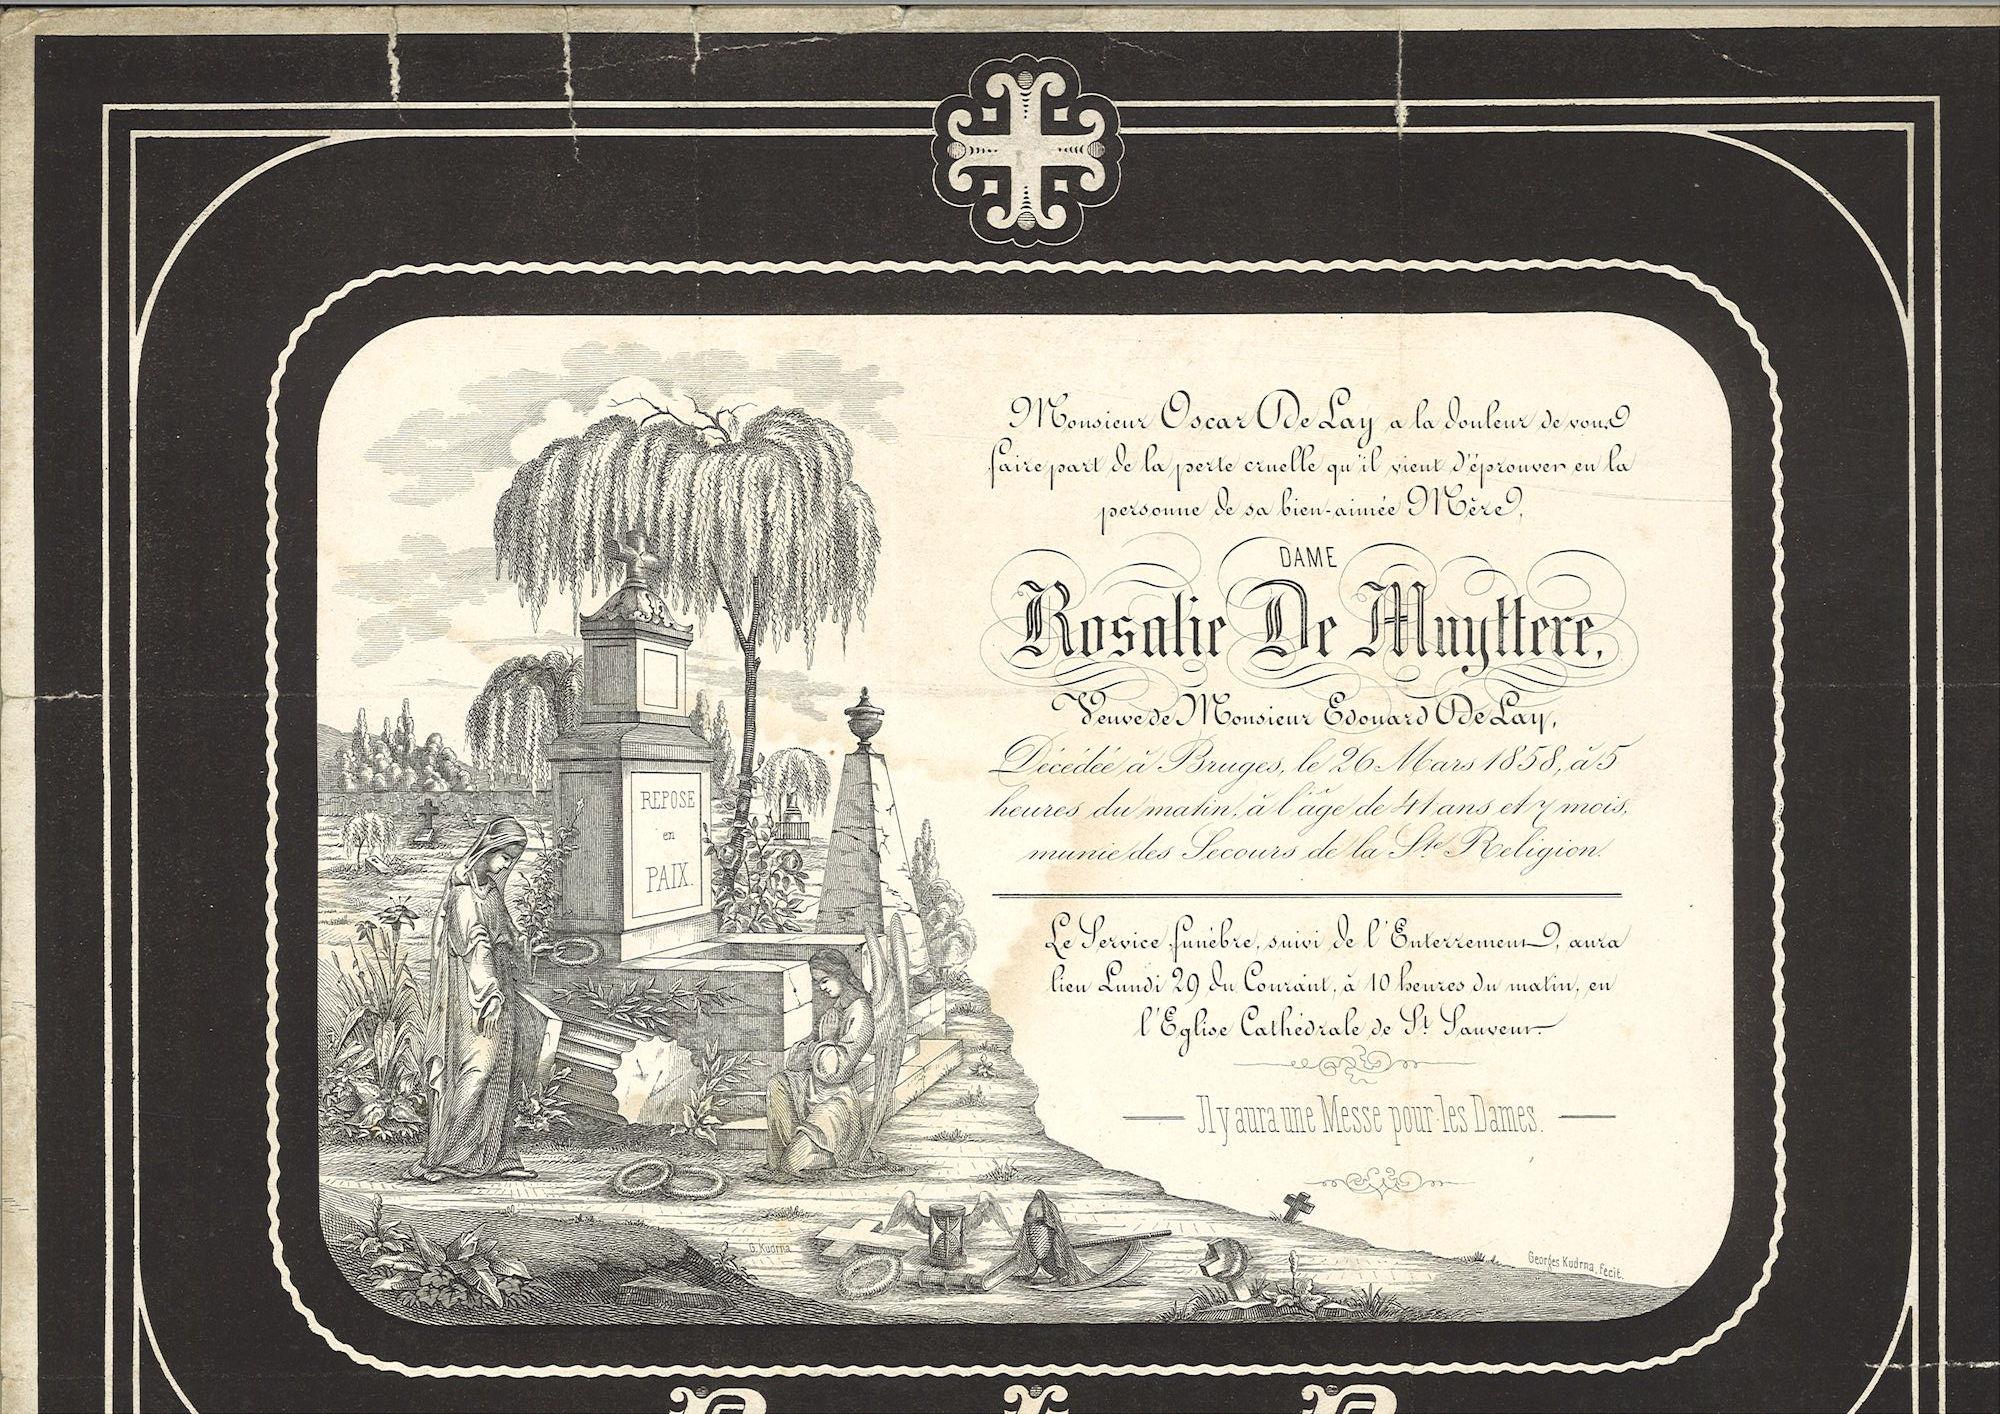 Rosalie De Muyttere